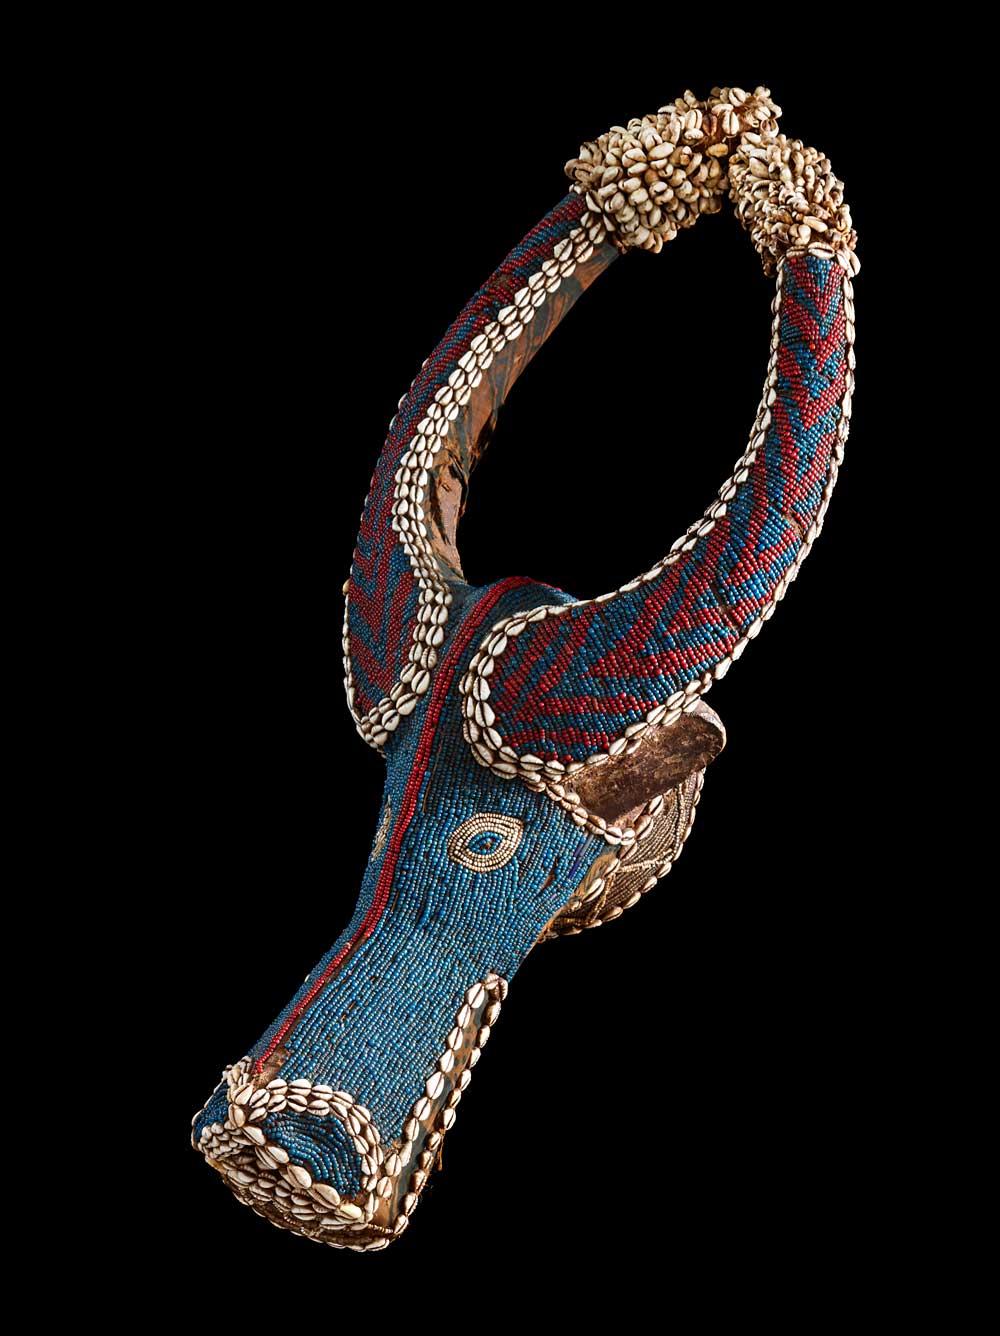 ausstellung-museum_rietberg_perlkunst_aus_afrika_skulptur-decohome.de_